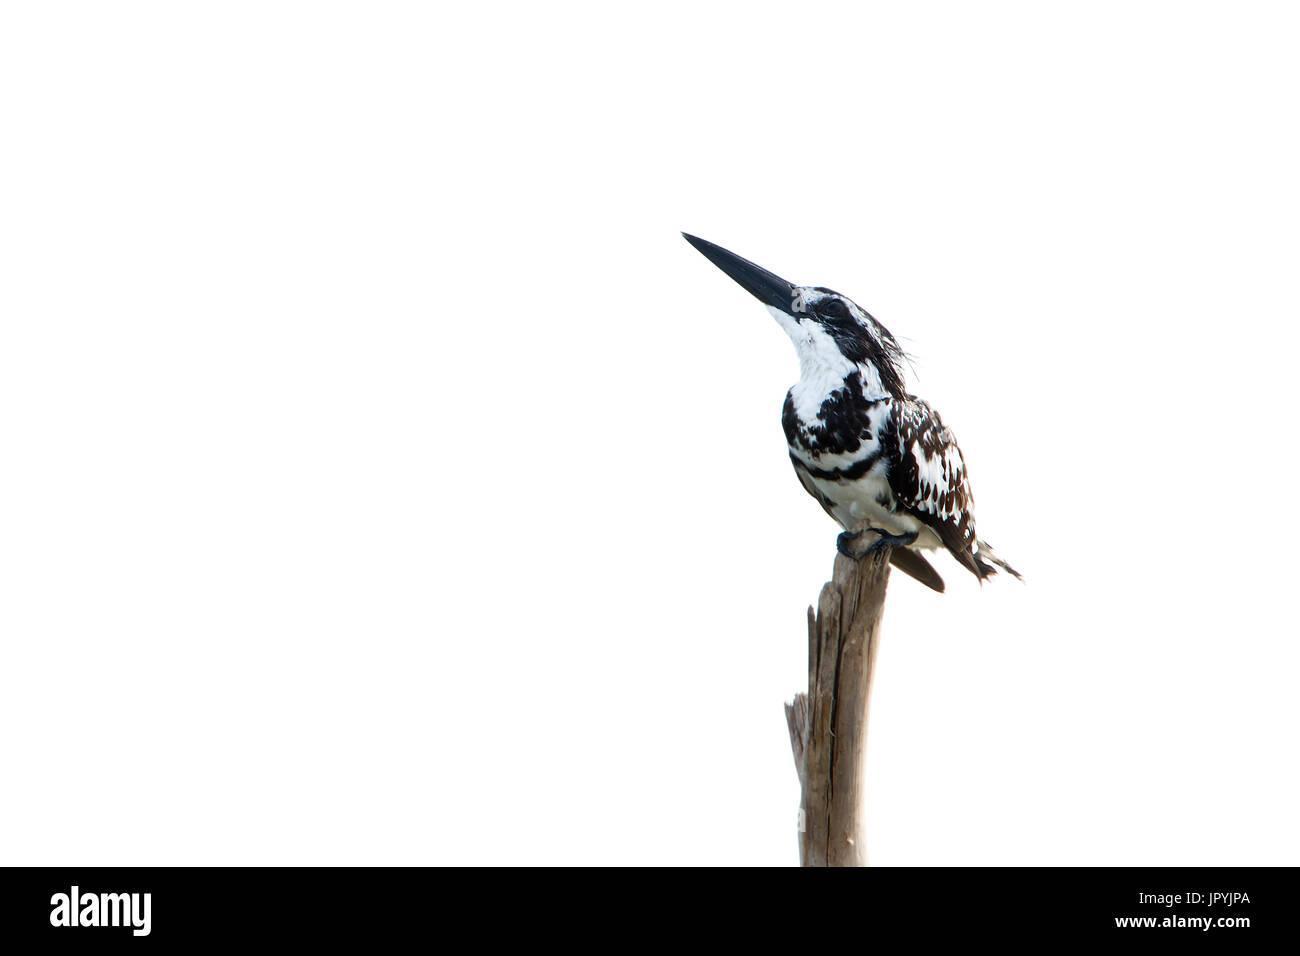 Pied kingfisher on a stake - Arugam bay Sri Lanka - Stock Image